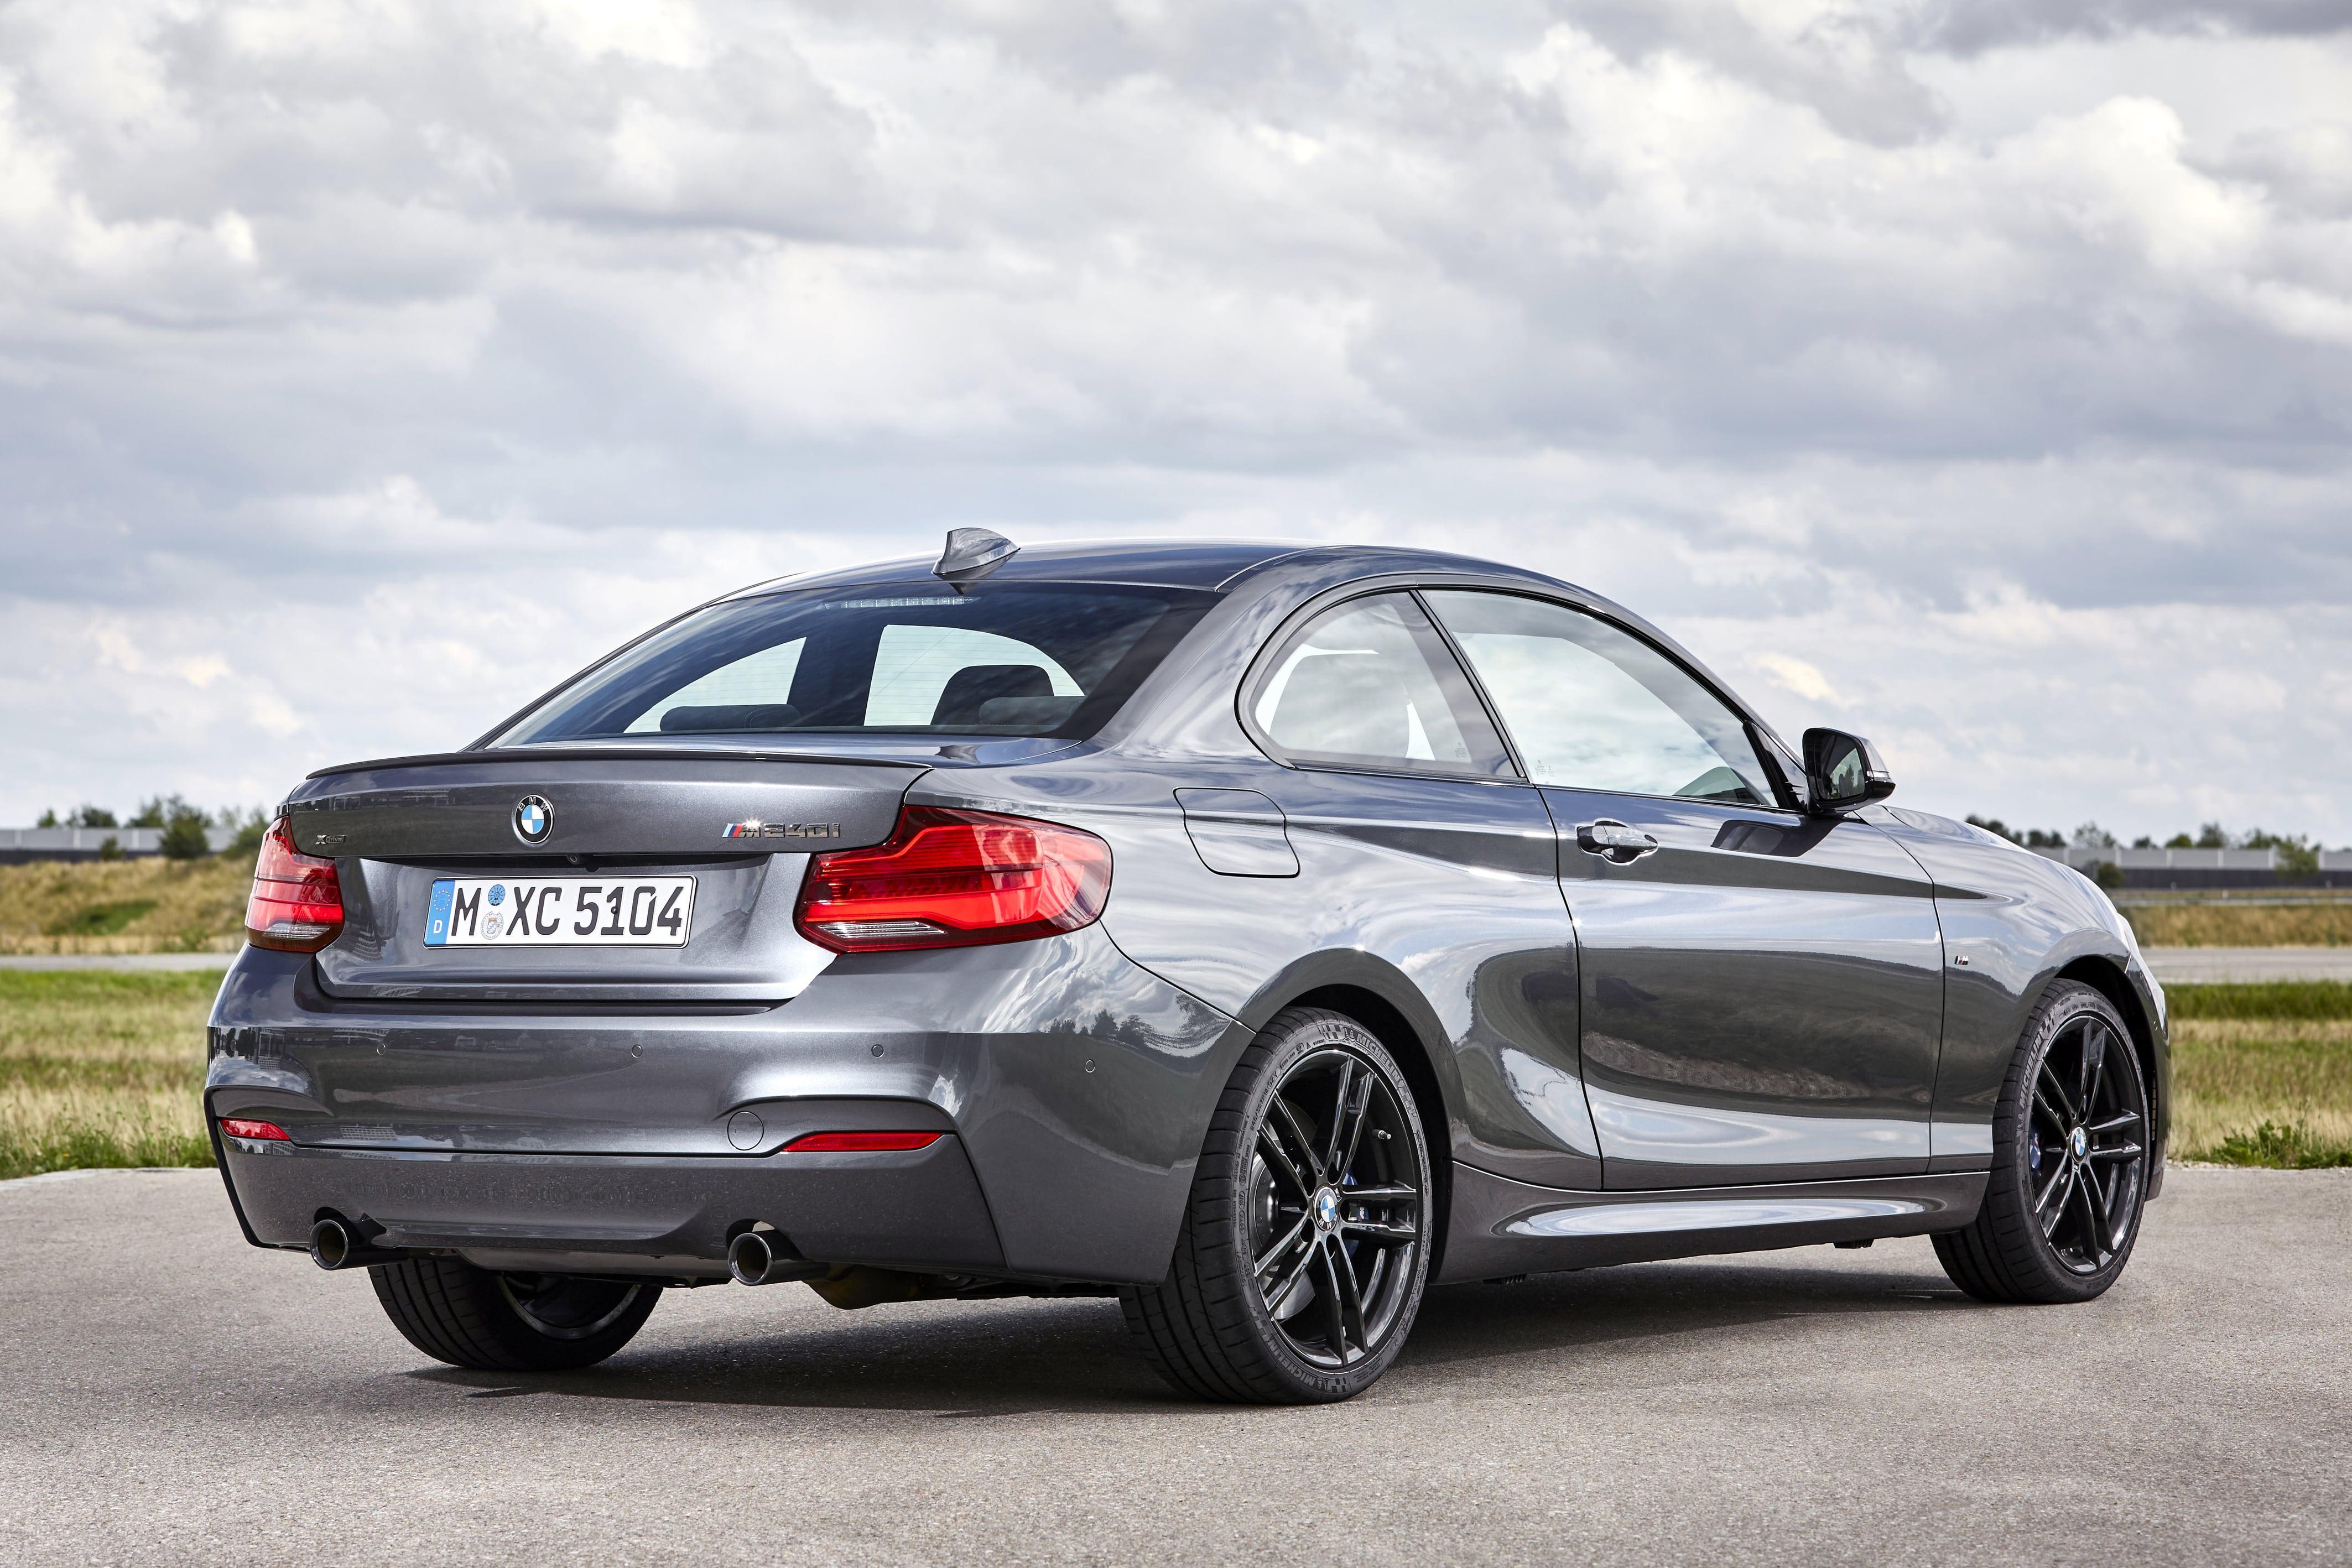 2020 BMW M550d Release Date